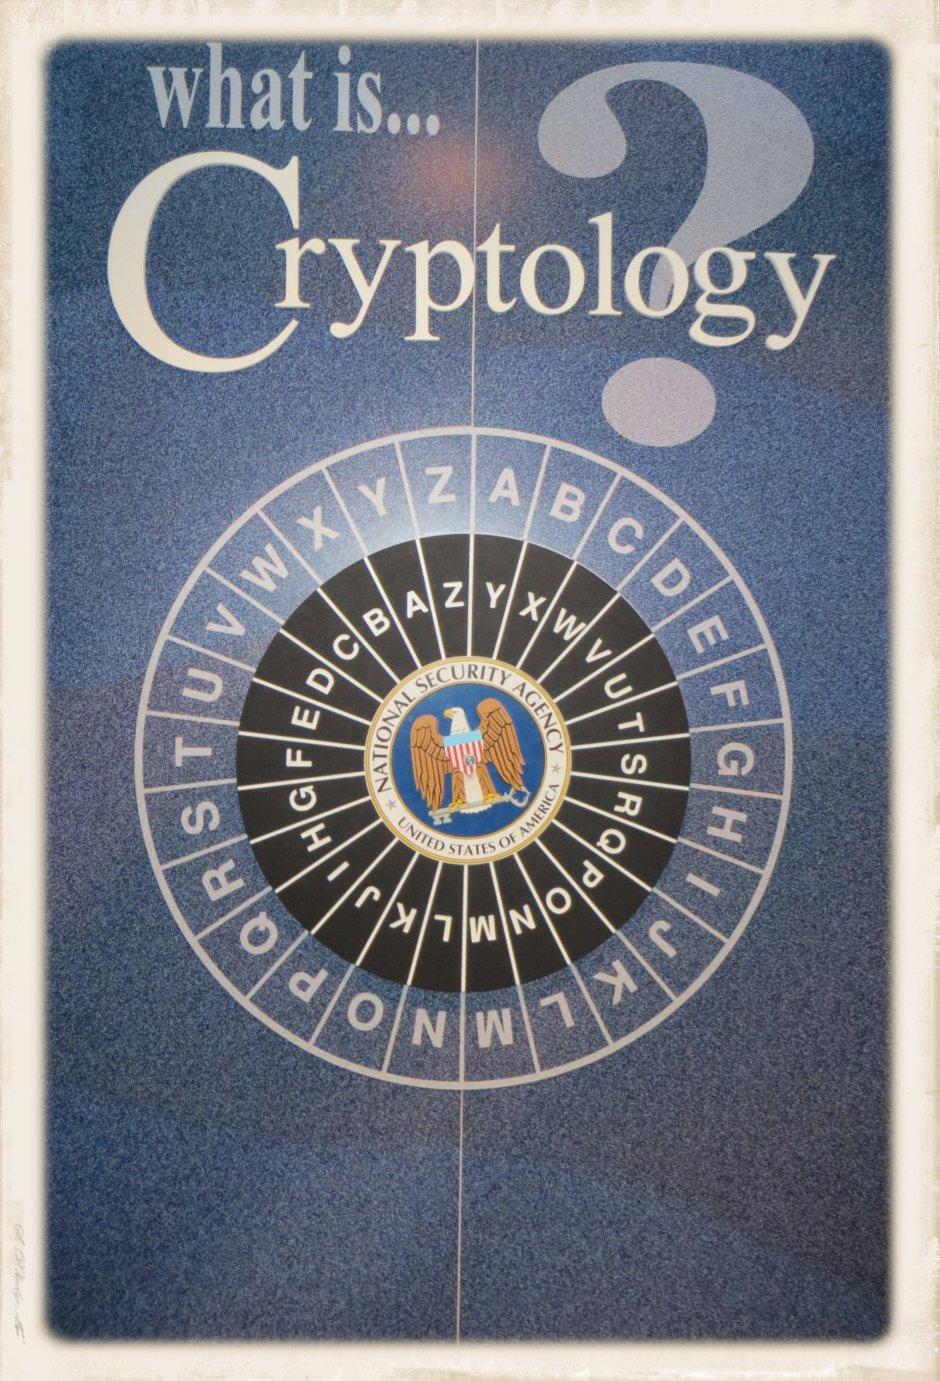 Cryptology museum 019